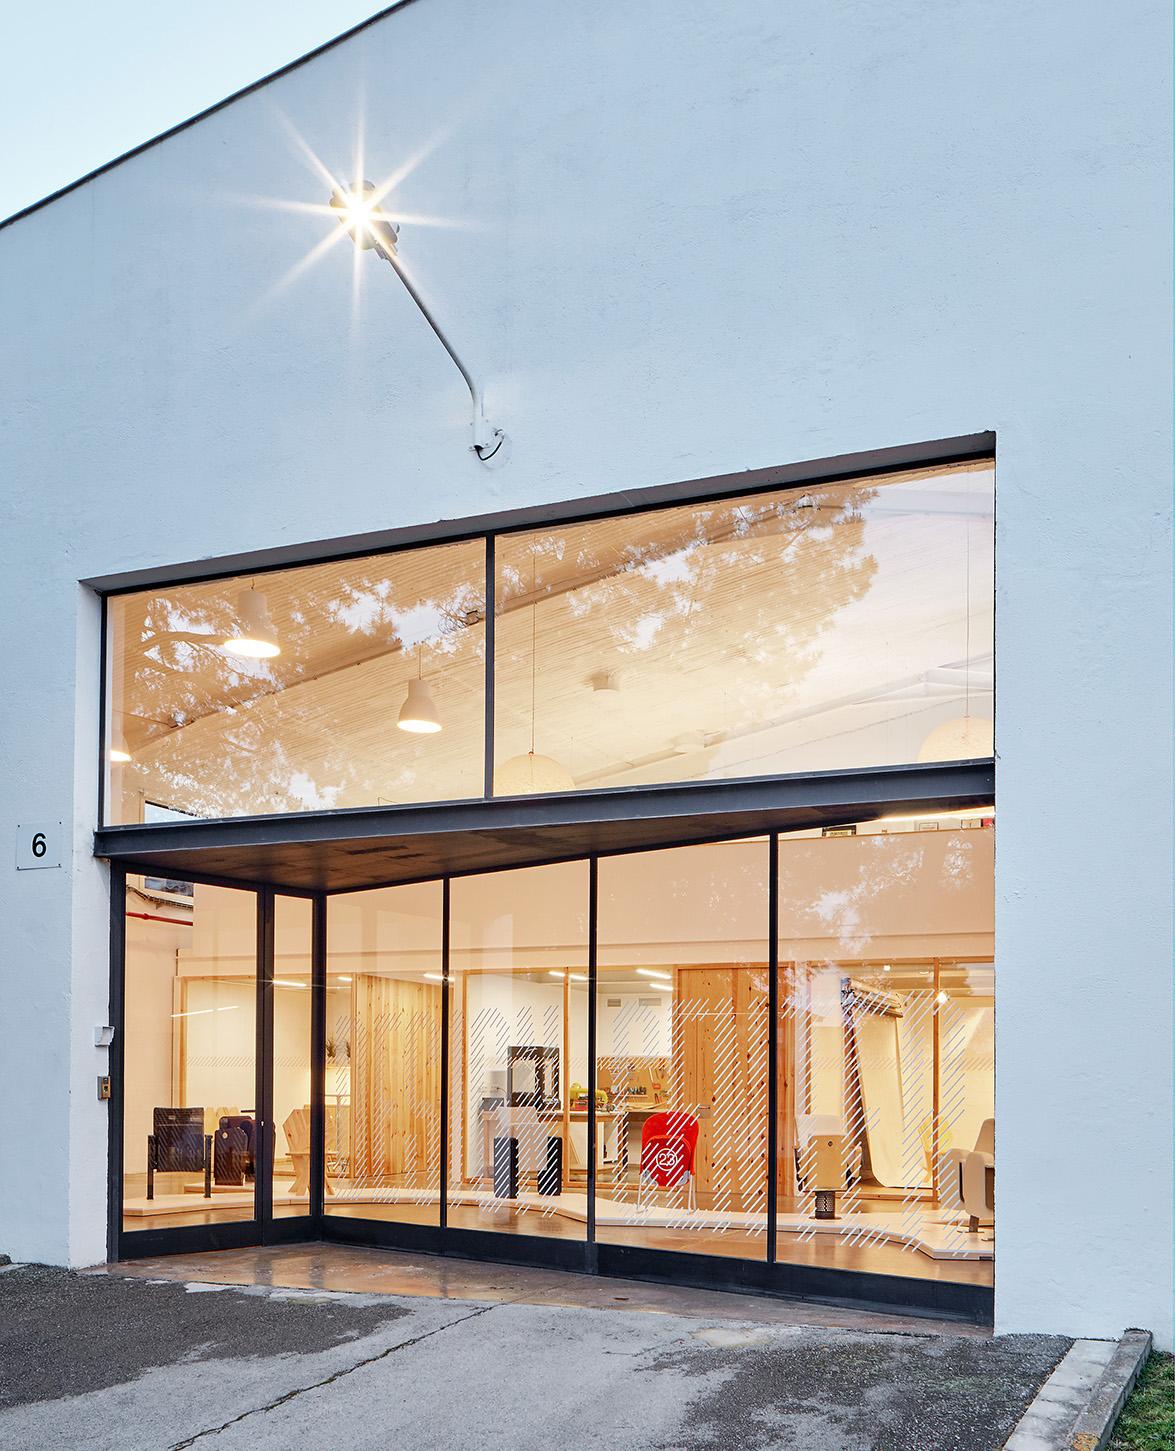 Miriam castells studio dise a el nuevo design centre - Disena studio ...